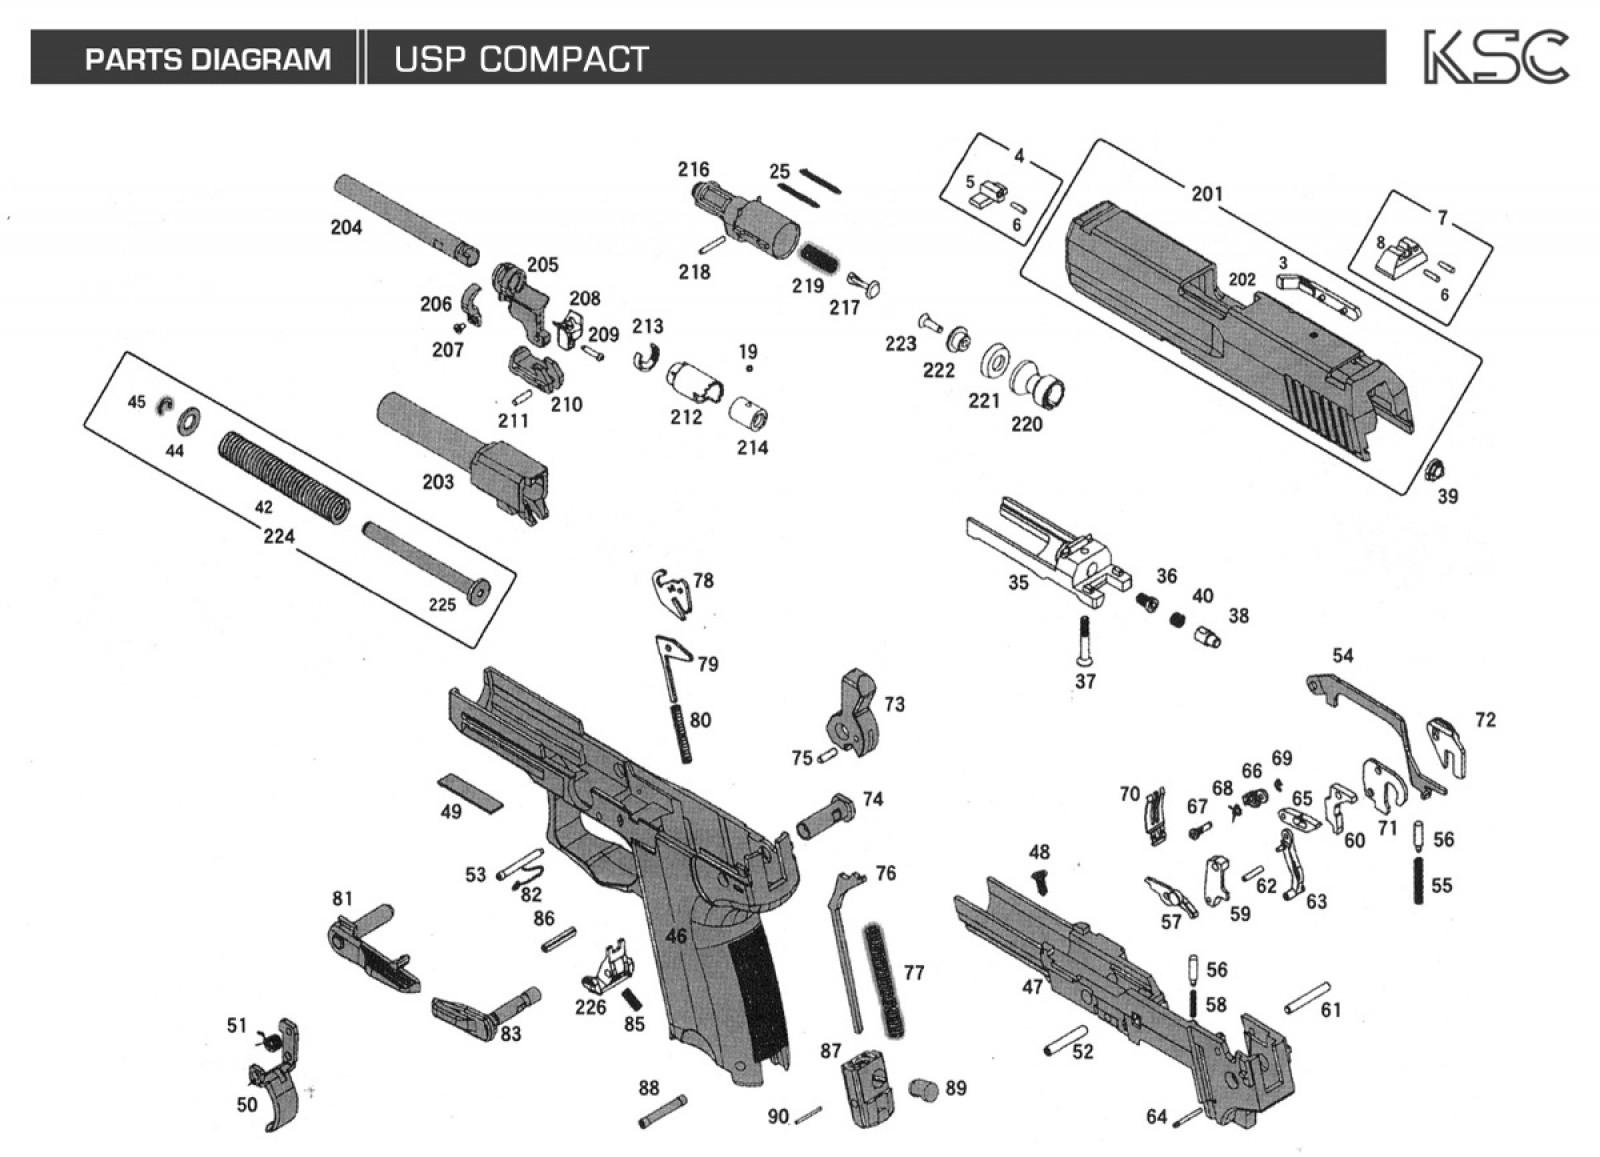 glock 23 disassembly diagram hobbes and locke venn diy my airsoft gun other things